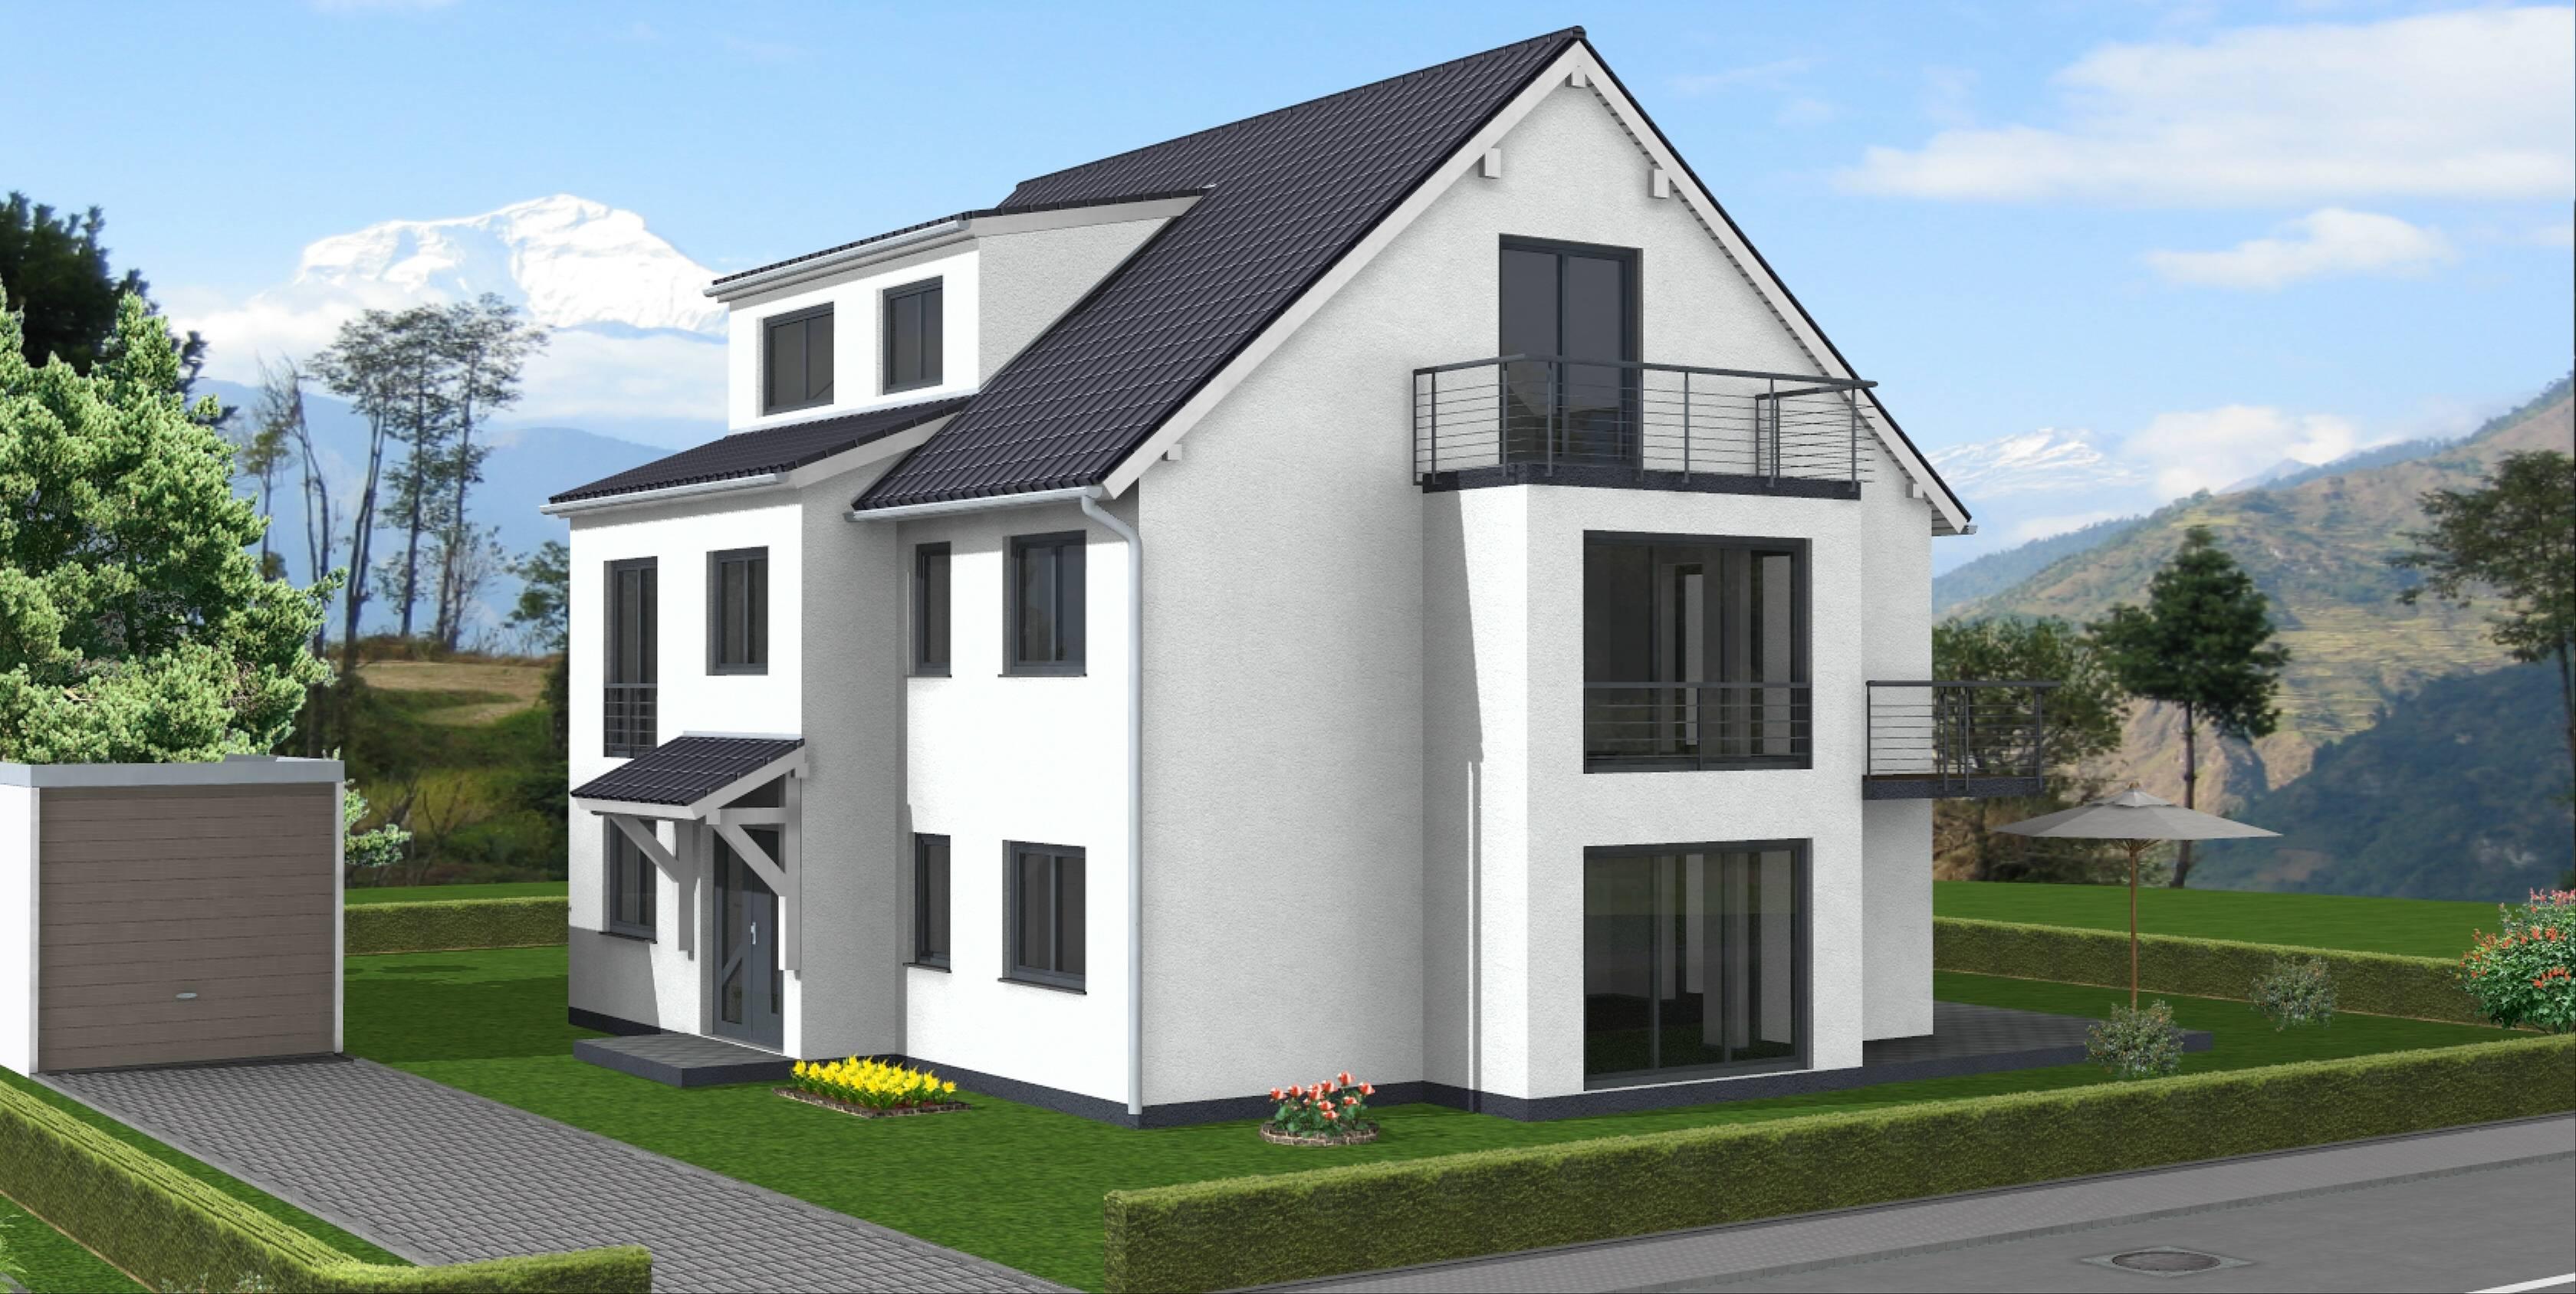 Passivhaus fertighaus  Fertighaus Bauen Günstig: Gussek haus bungalows landhäuser ...